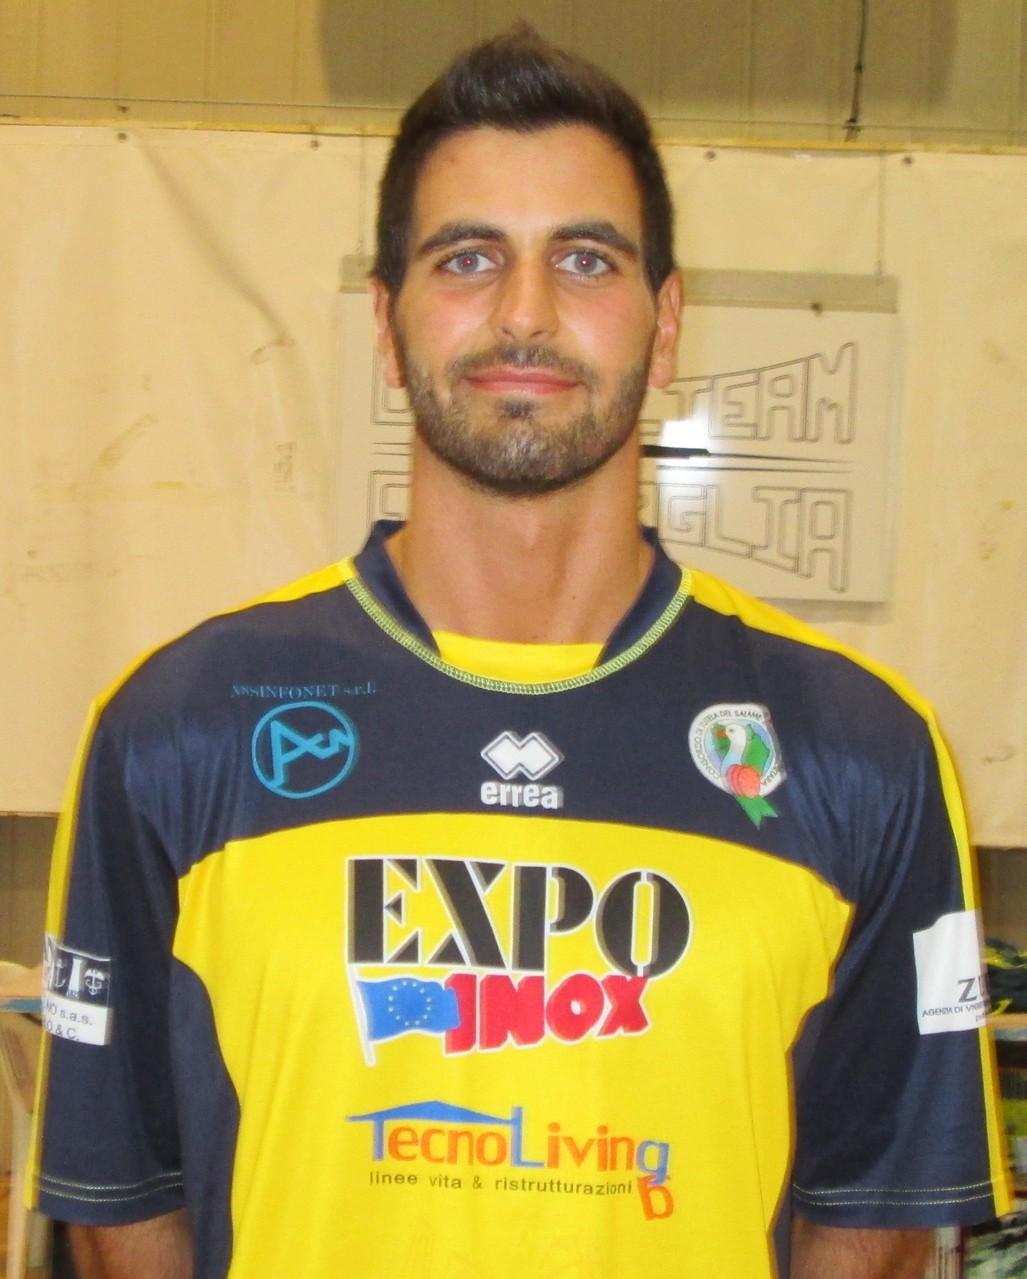 #16 - Marco DI PAOLA